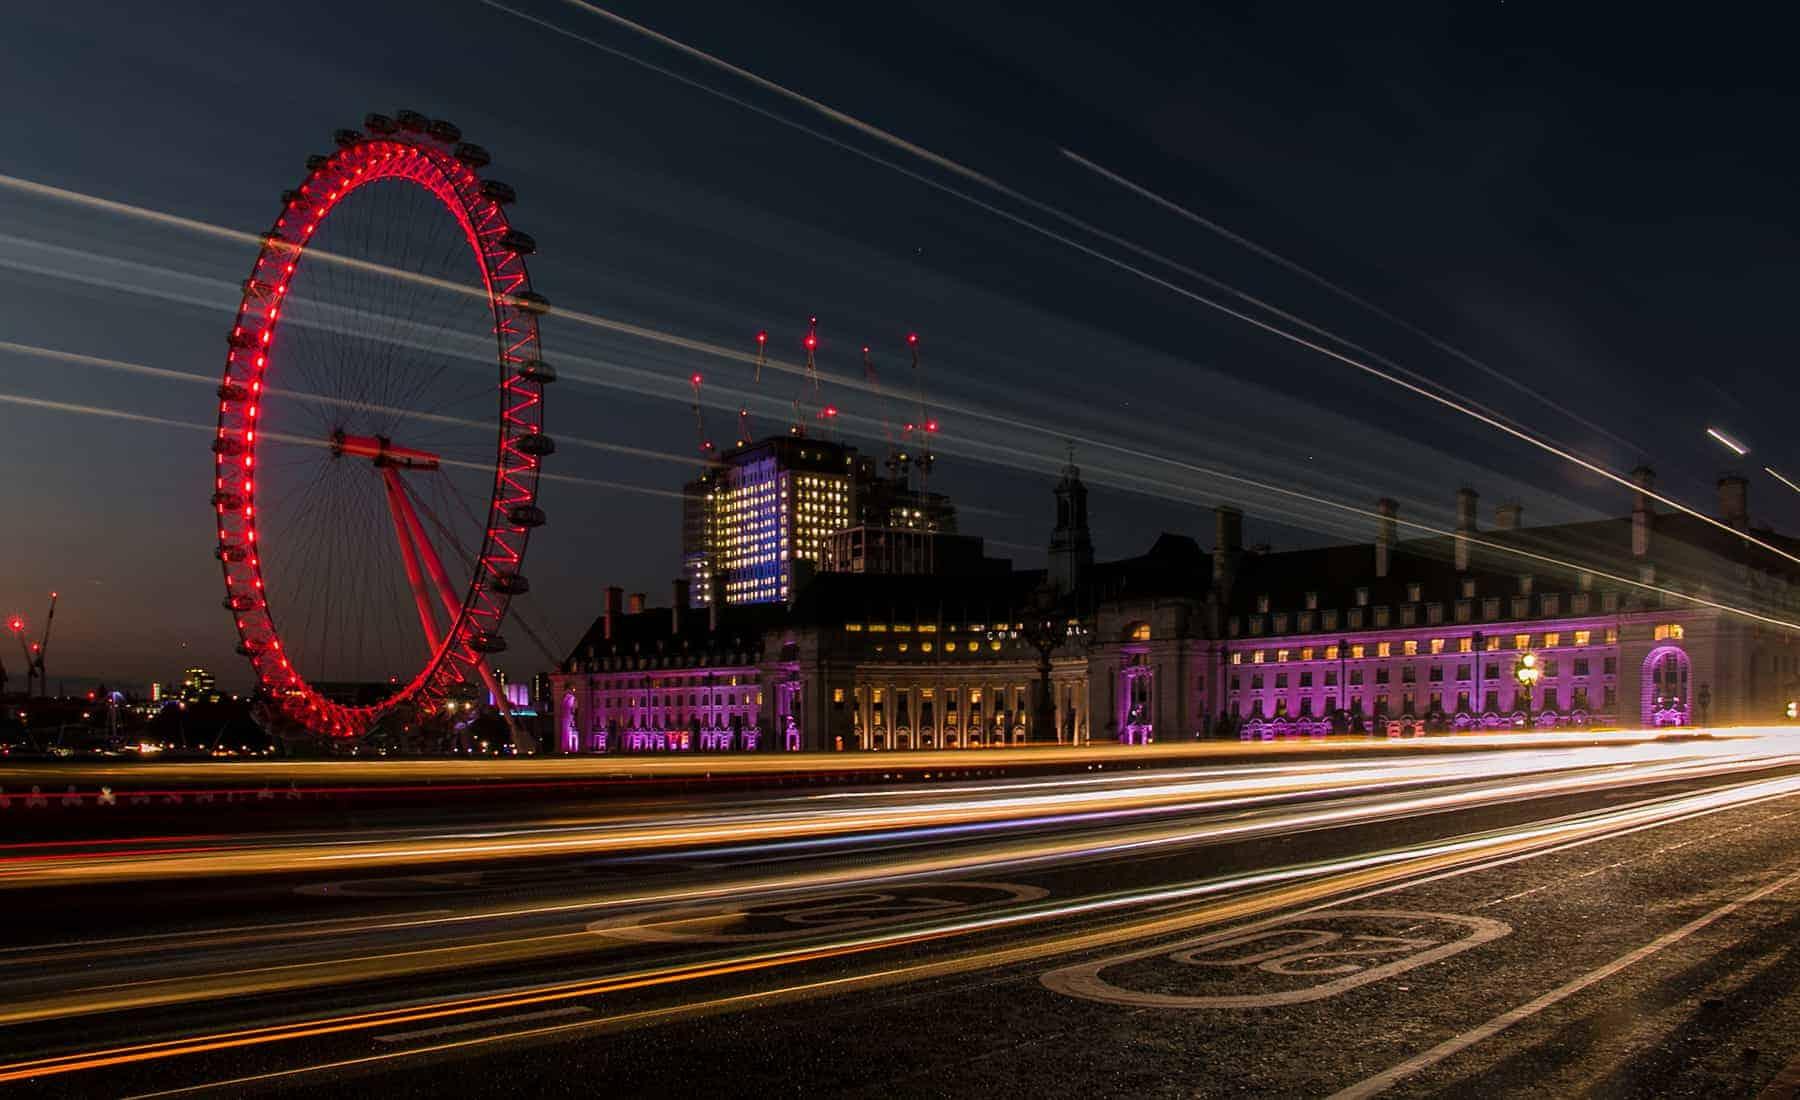 London Eye Ferris wheel at night